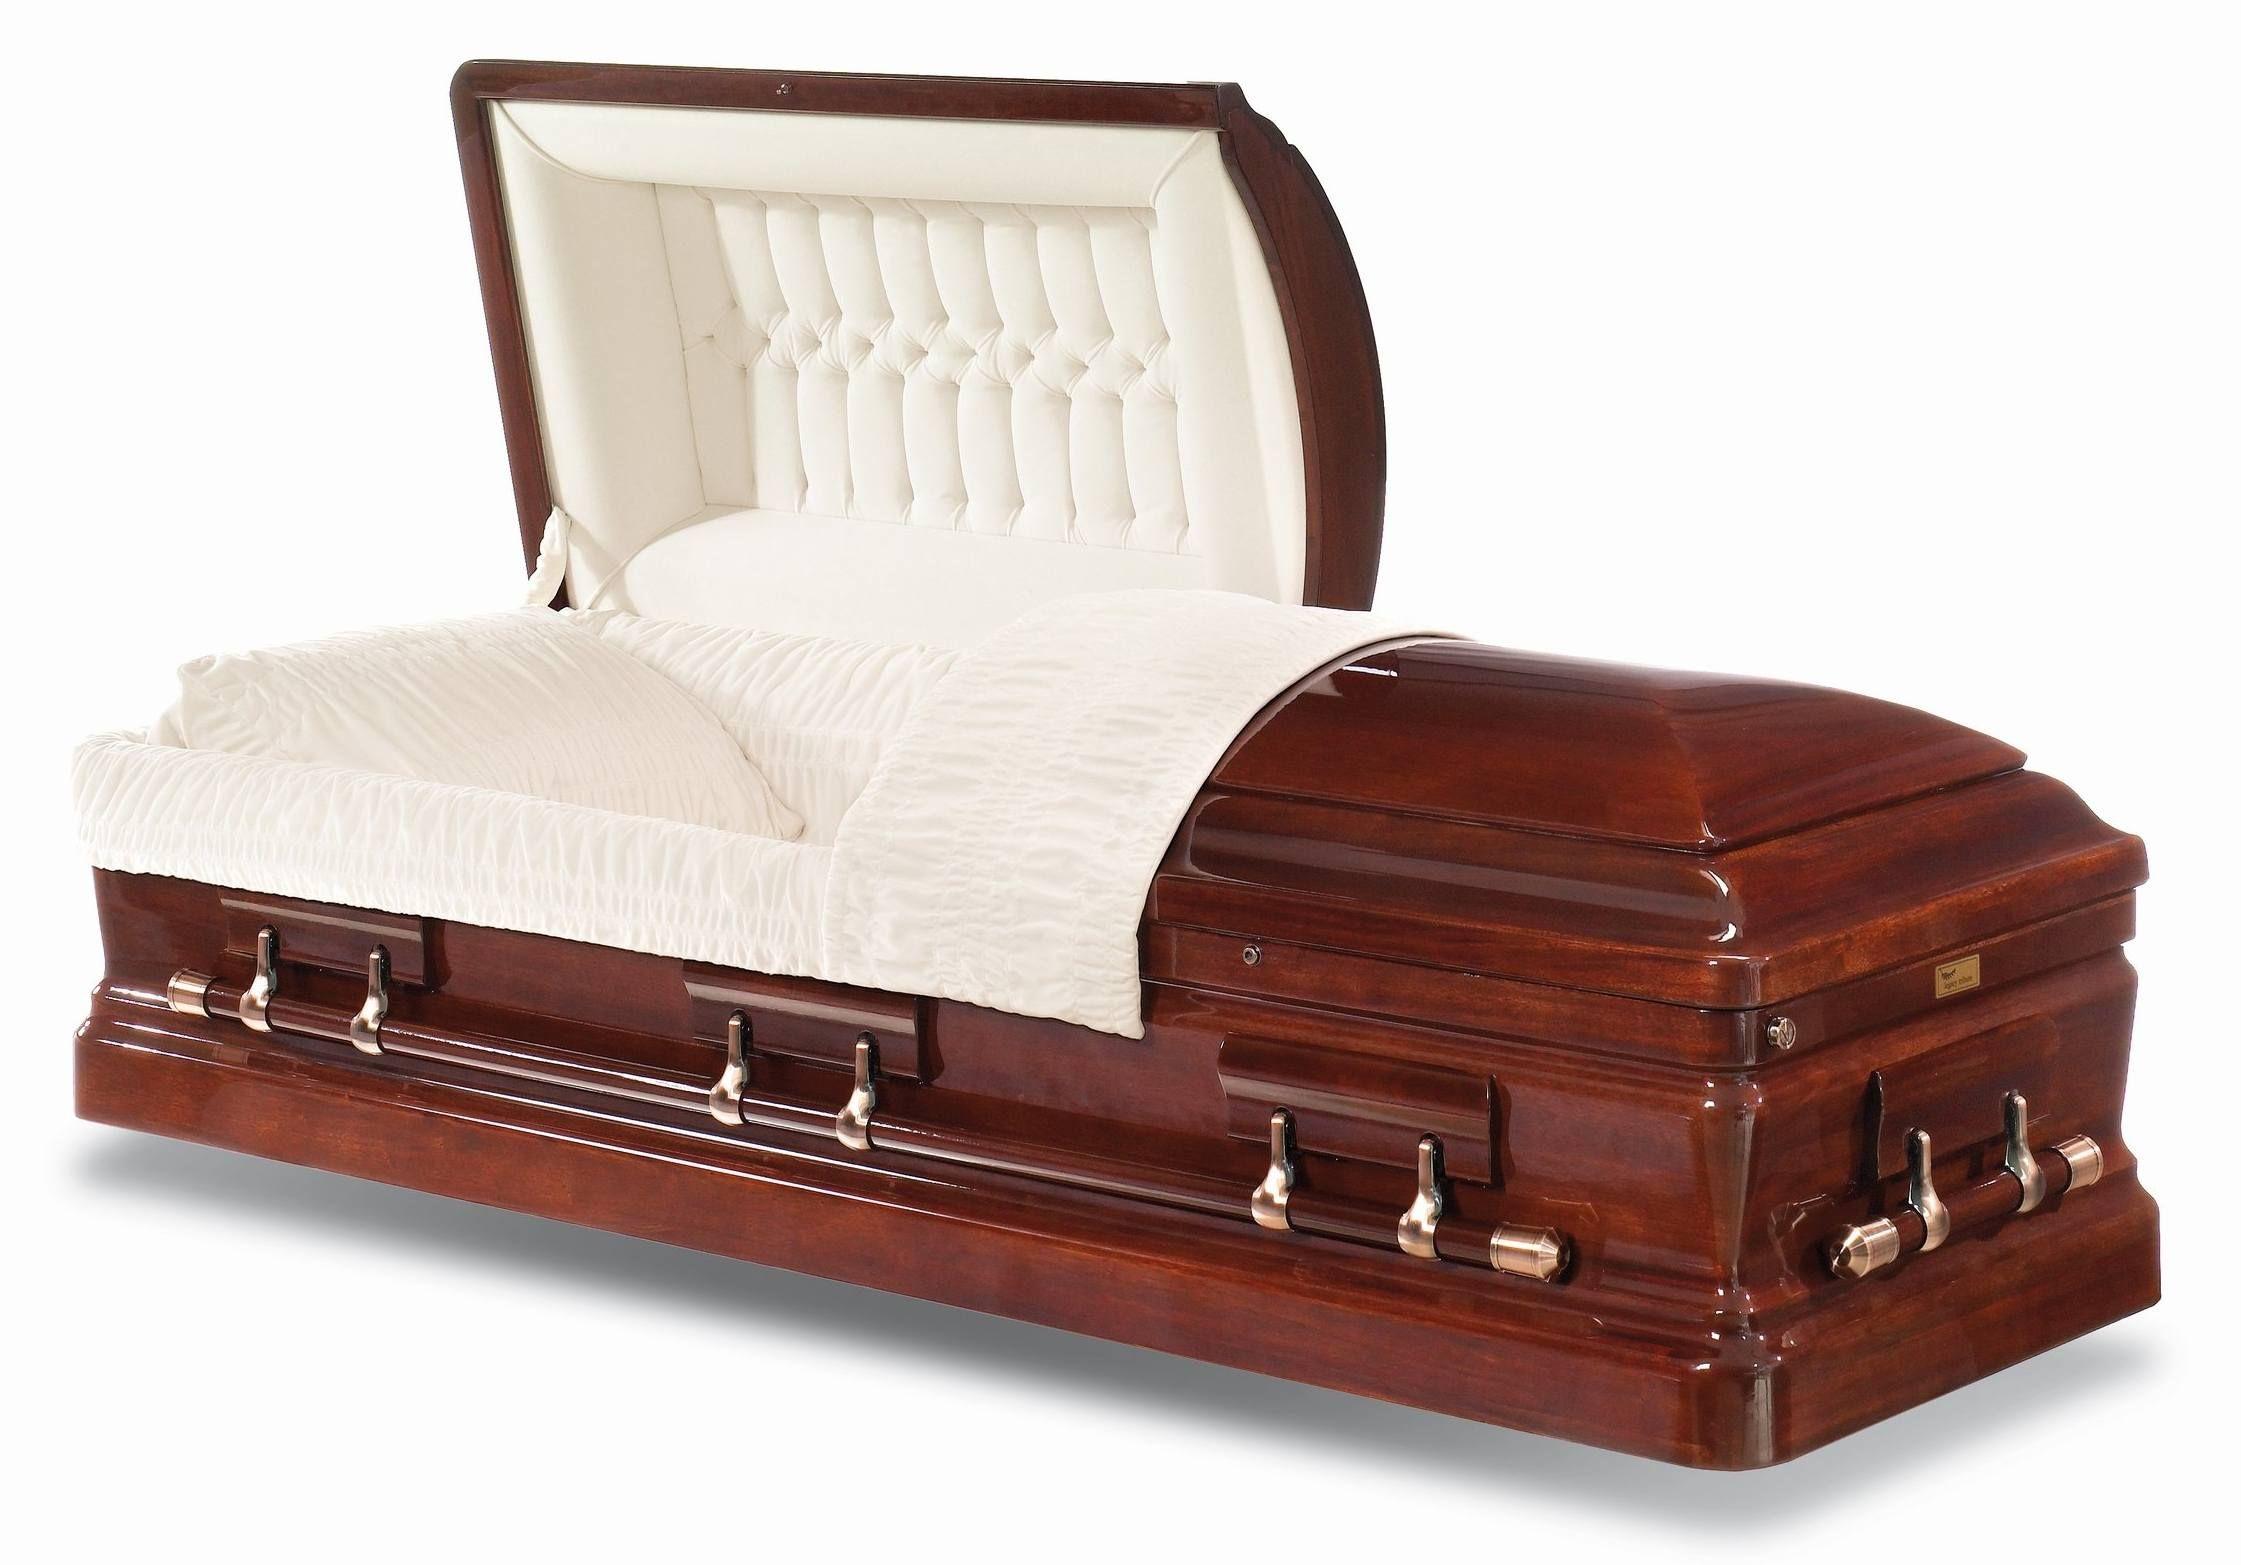 Capital Mahogany Wood Casket Wood casket, Mahogany wood